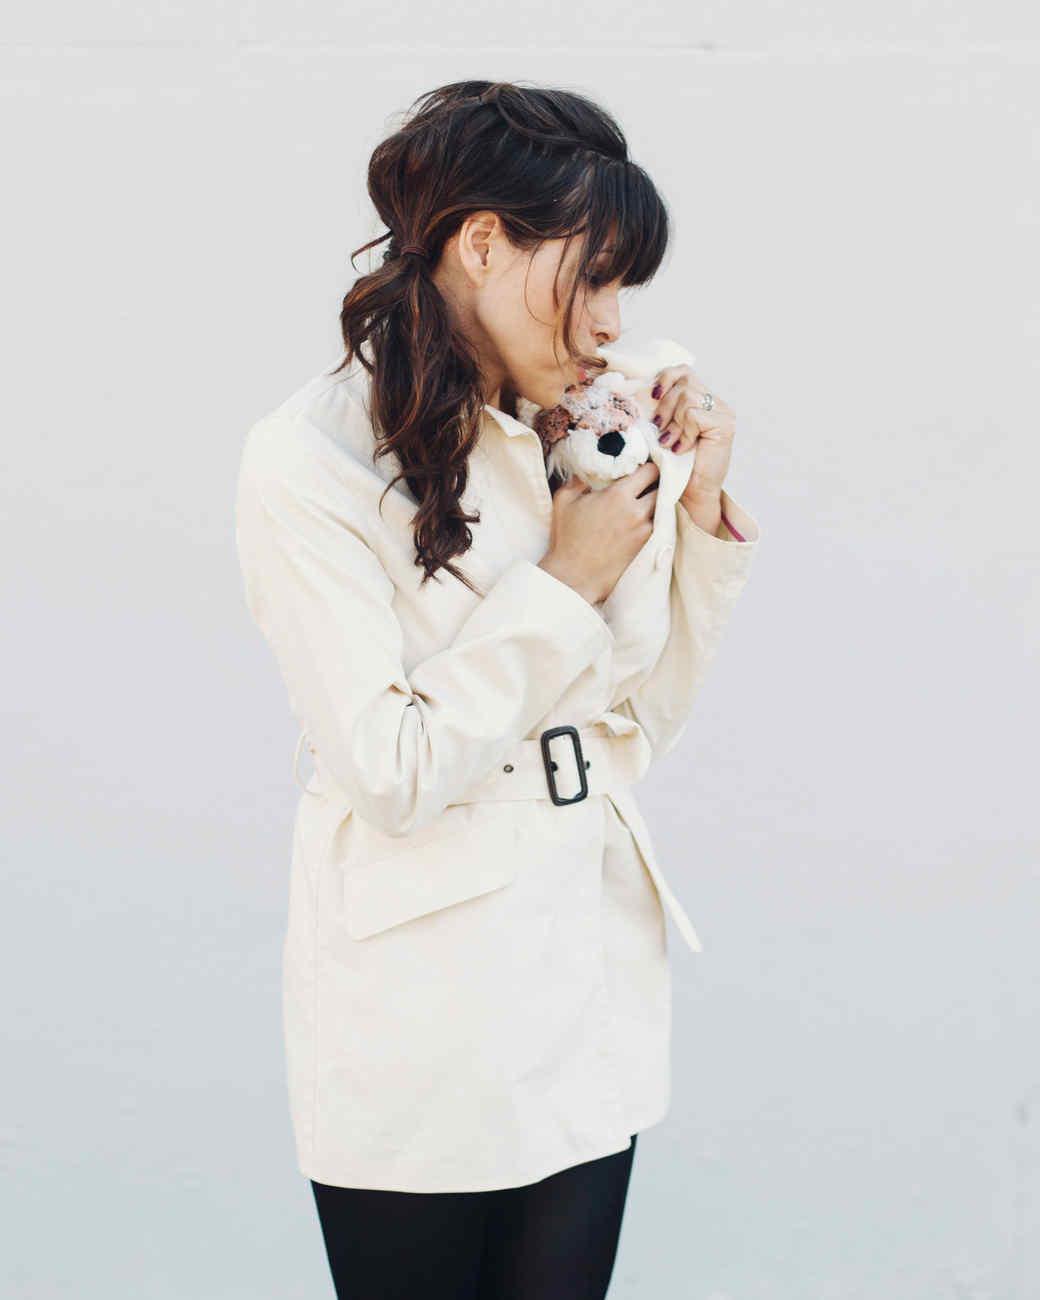 chelsey-heidorn-hollyandcat.jpg